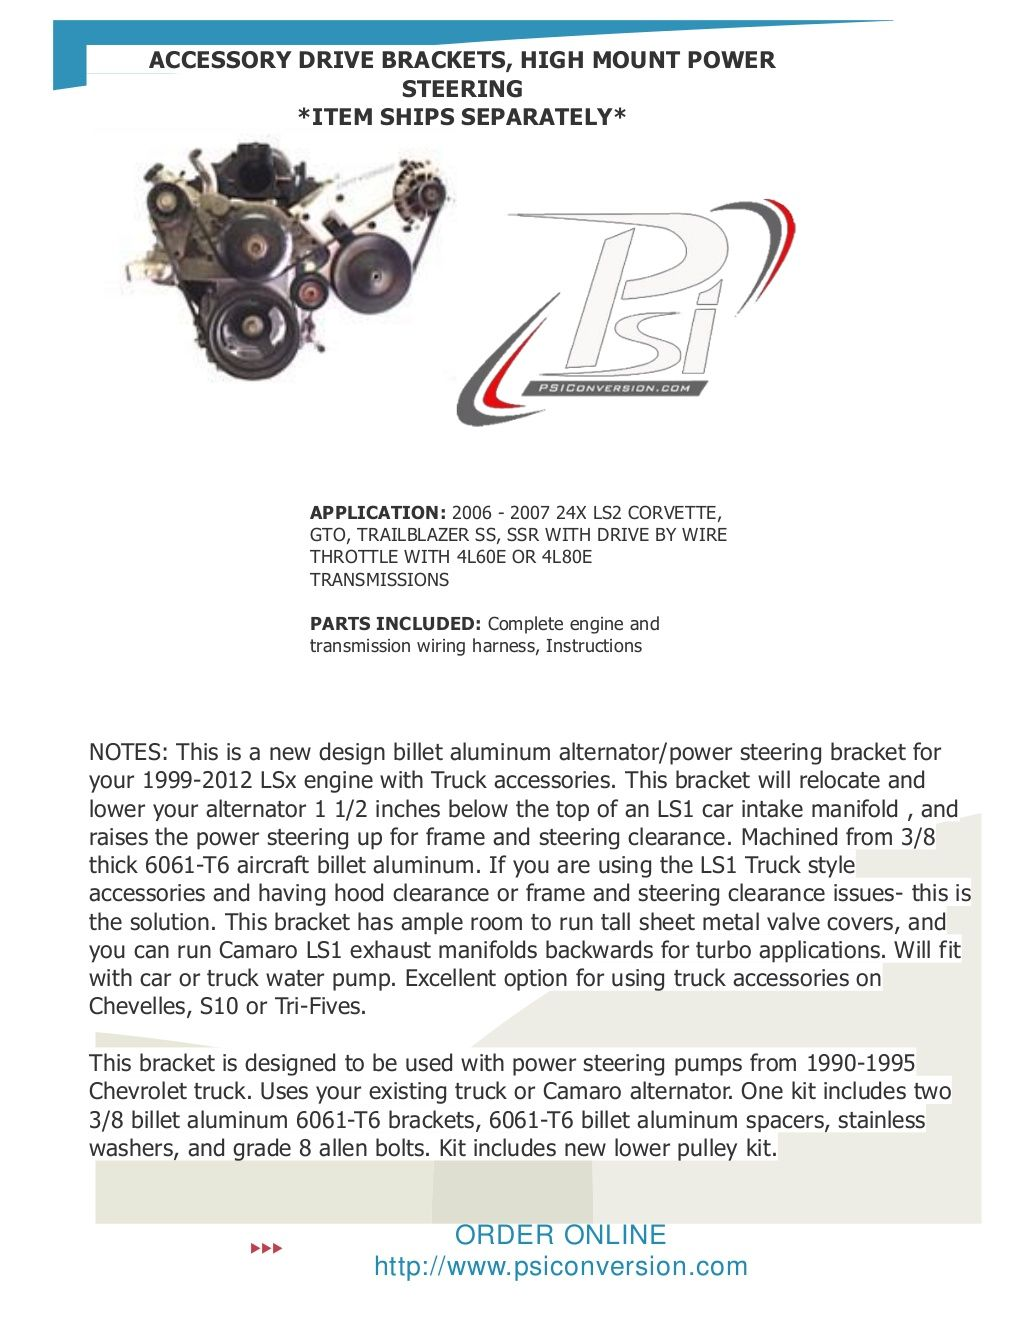 medium resolution of accessory drive brackets high mount power steering by psiconversion via slideshare trailblazer ss truck